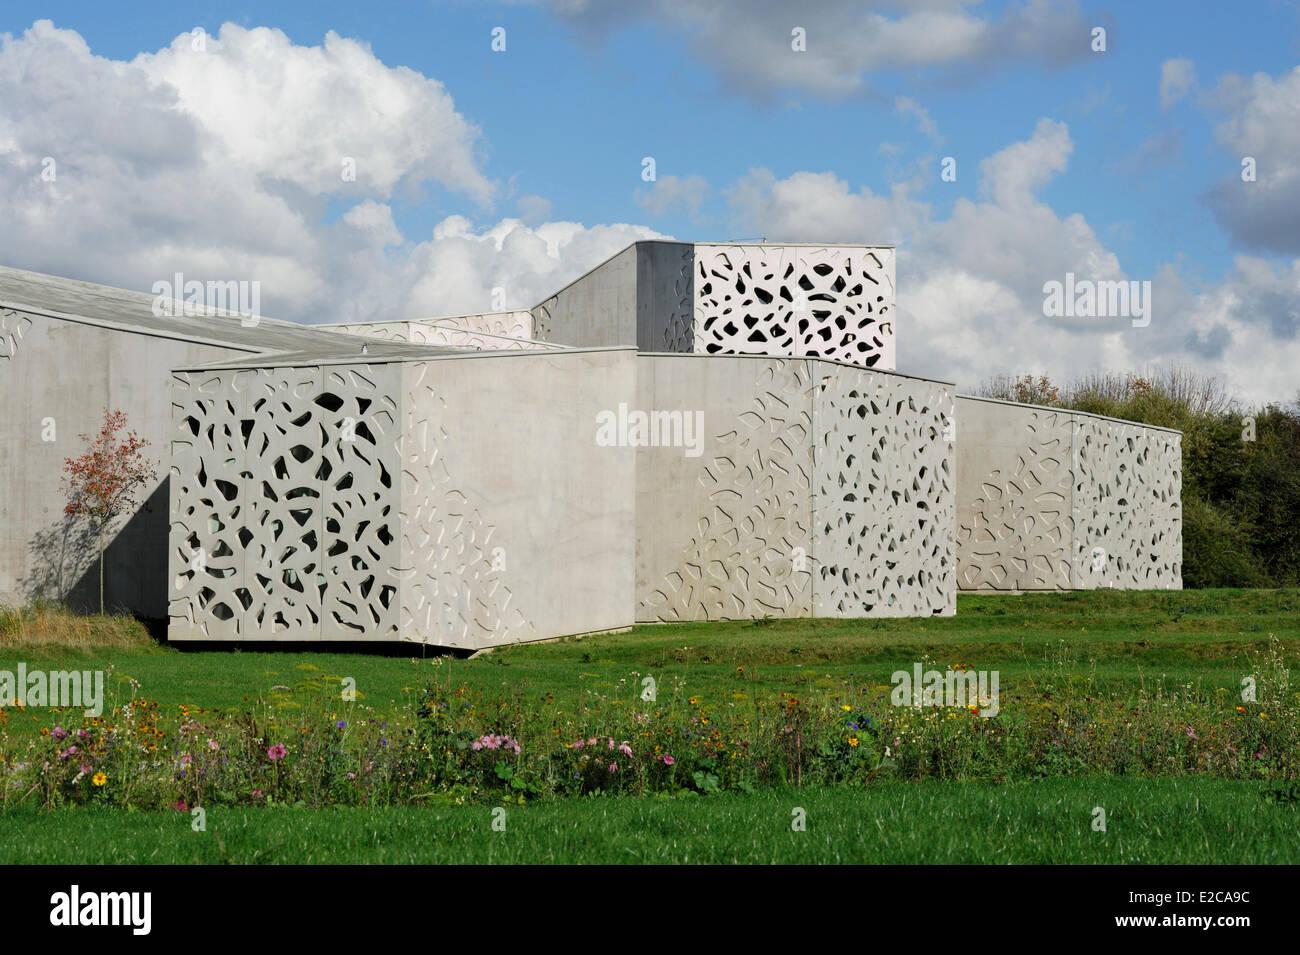 Frankreich, Nord, Villeneuve d ' Ascq, LAM (Lille Metropole Museum of Modern Art, zeitgenössische Kunst Stockbild